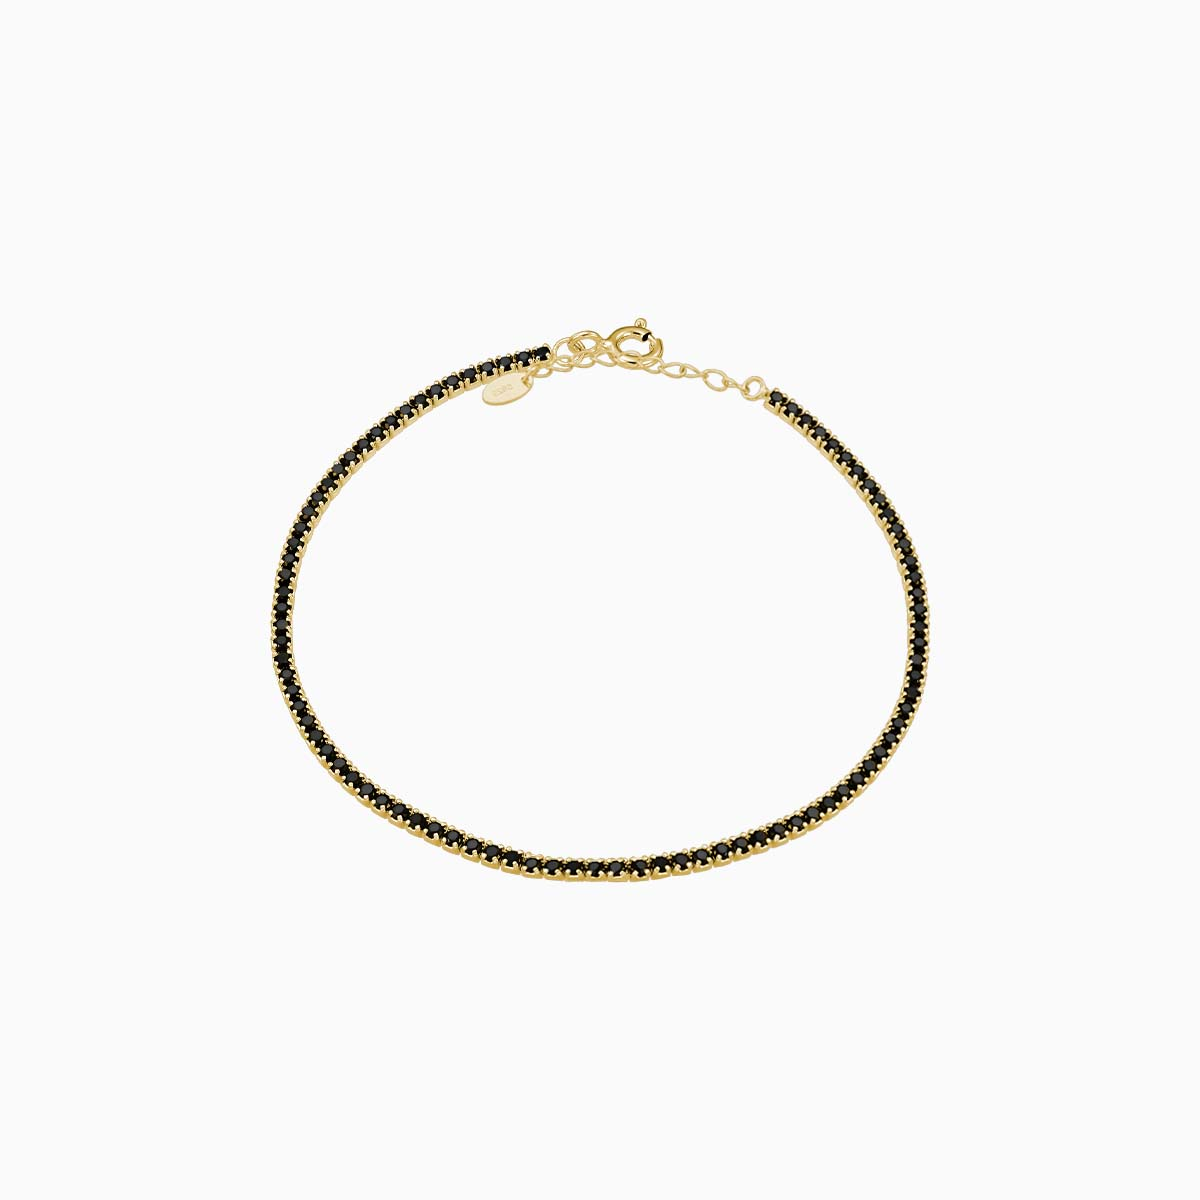 Bratara din argint Manissi tennis de 1.5 mm black gold